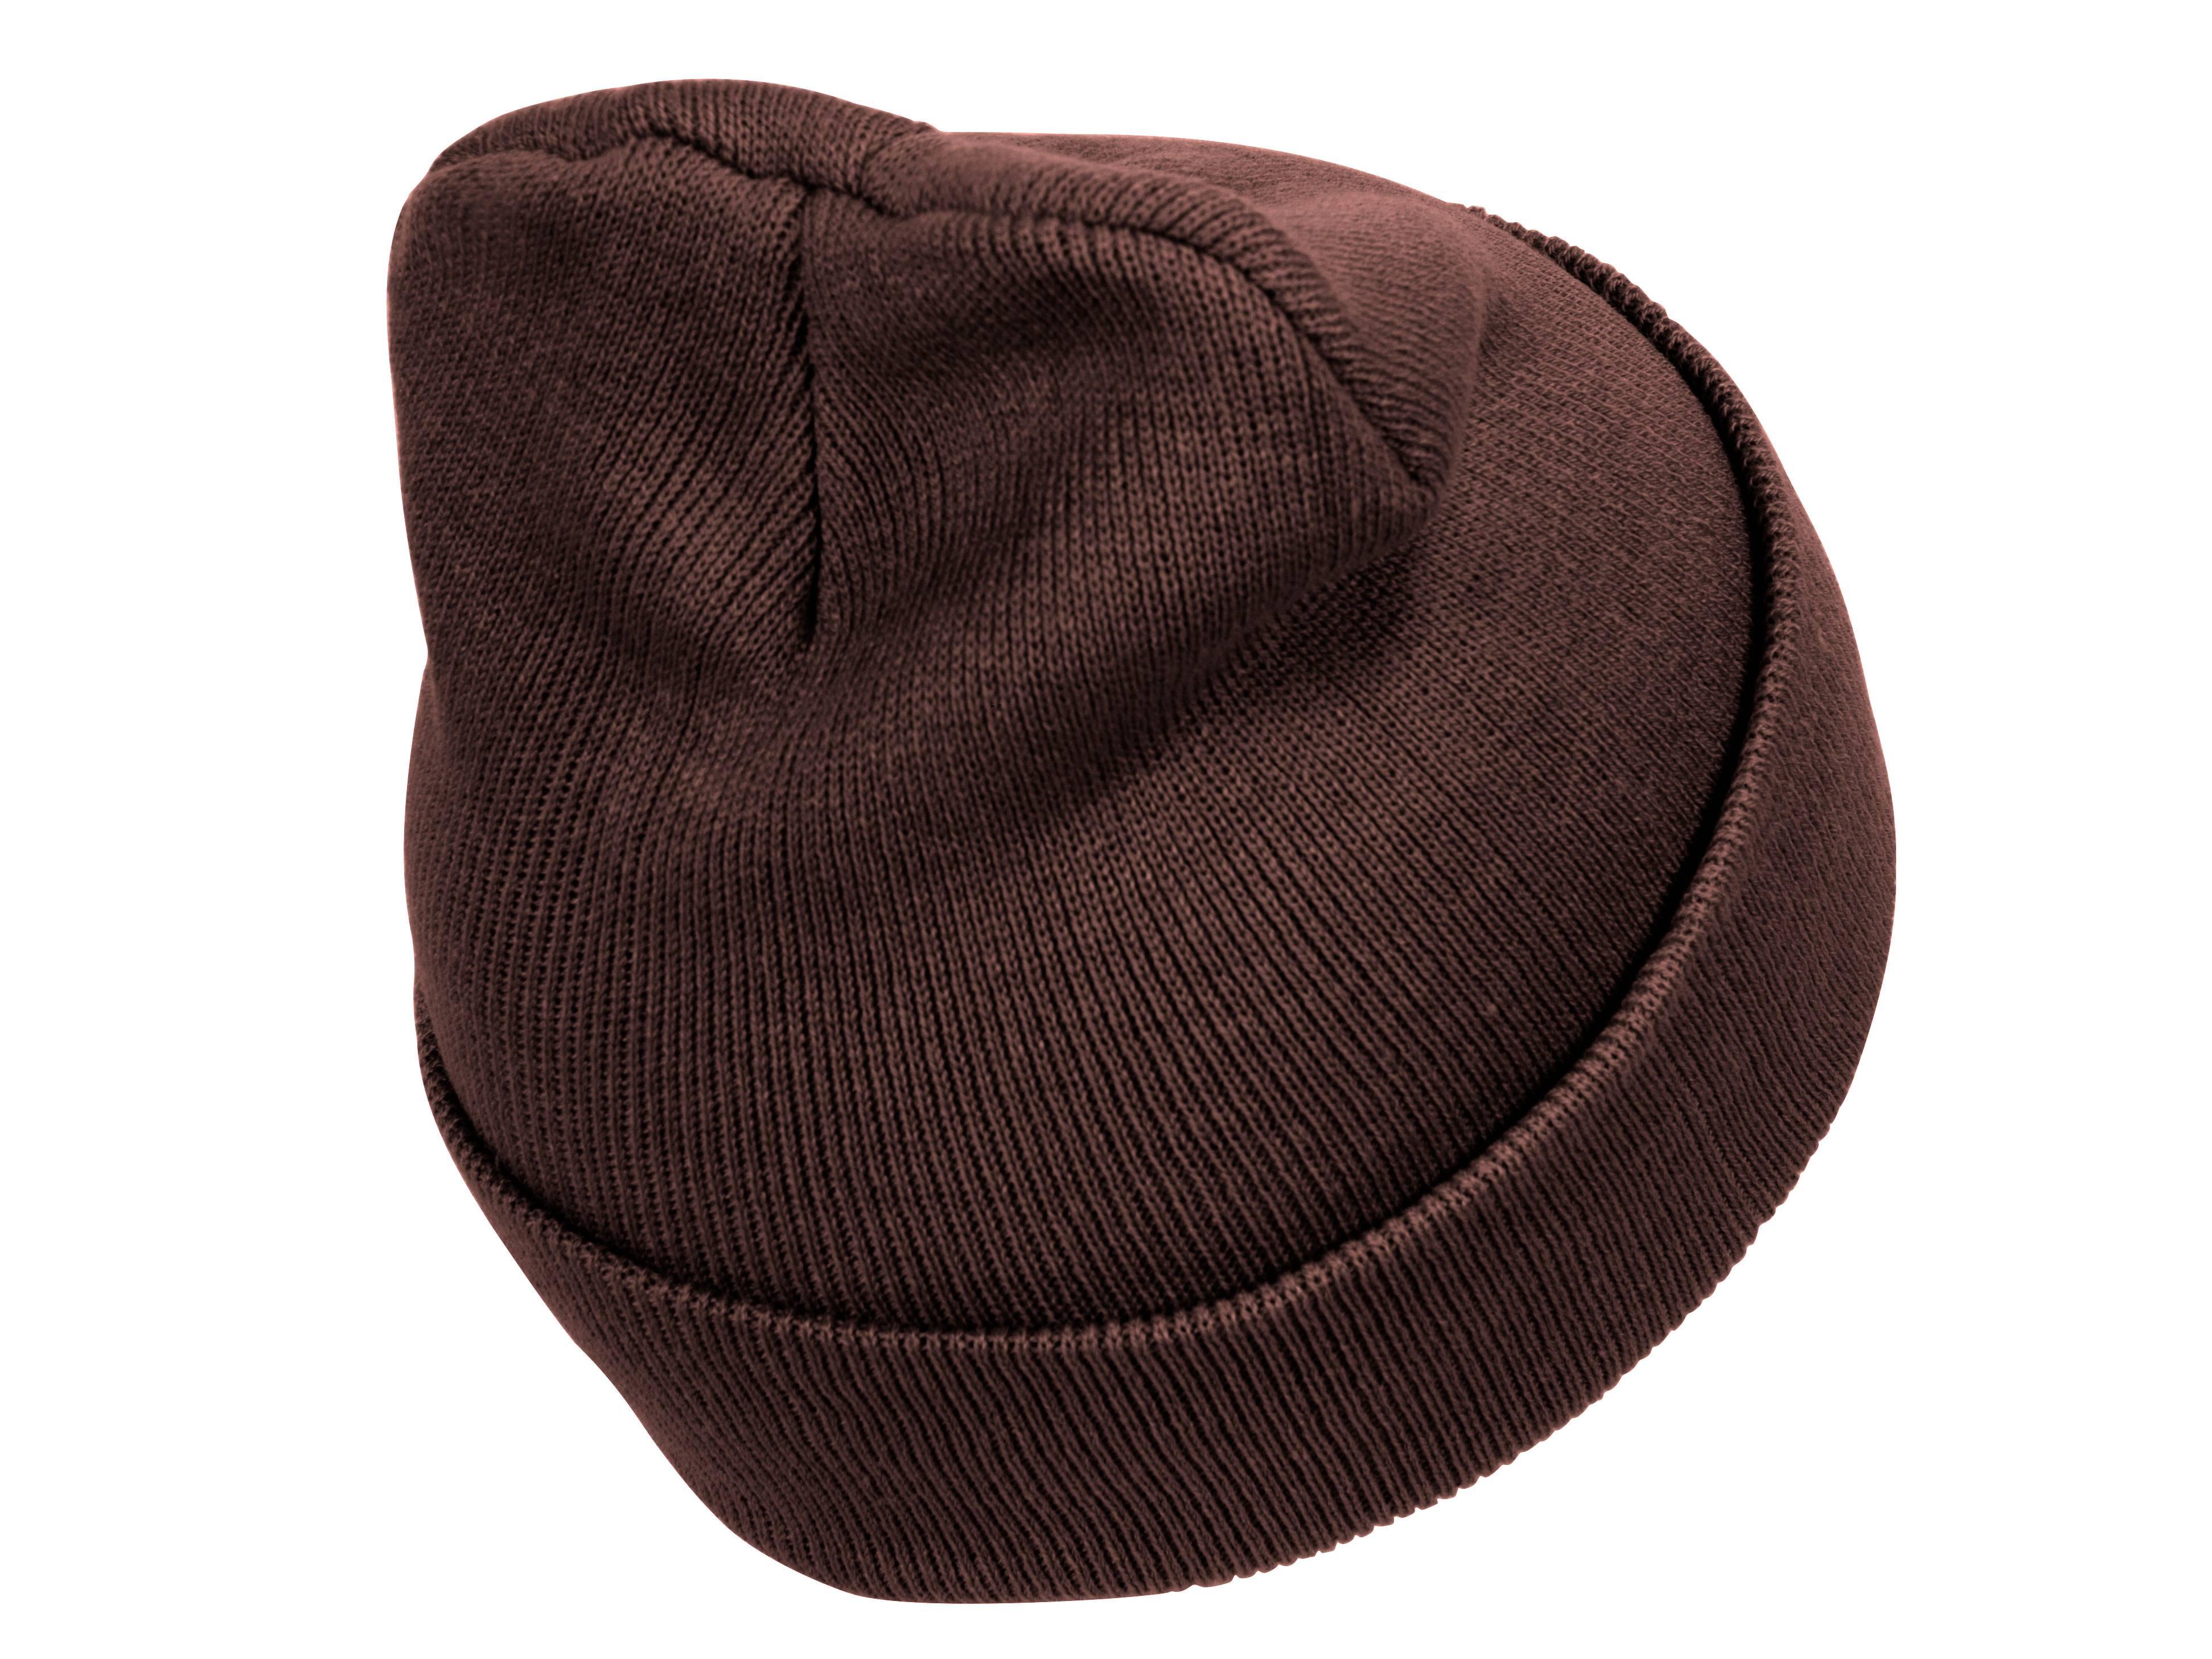 thumbnail 11 - Top Headwear Solid Winter Long Beanie - 12 Piece Wholesale